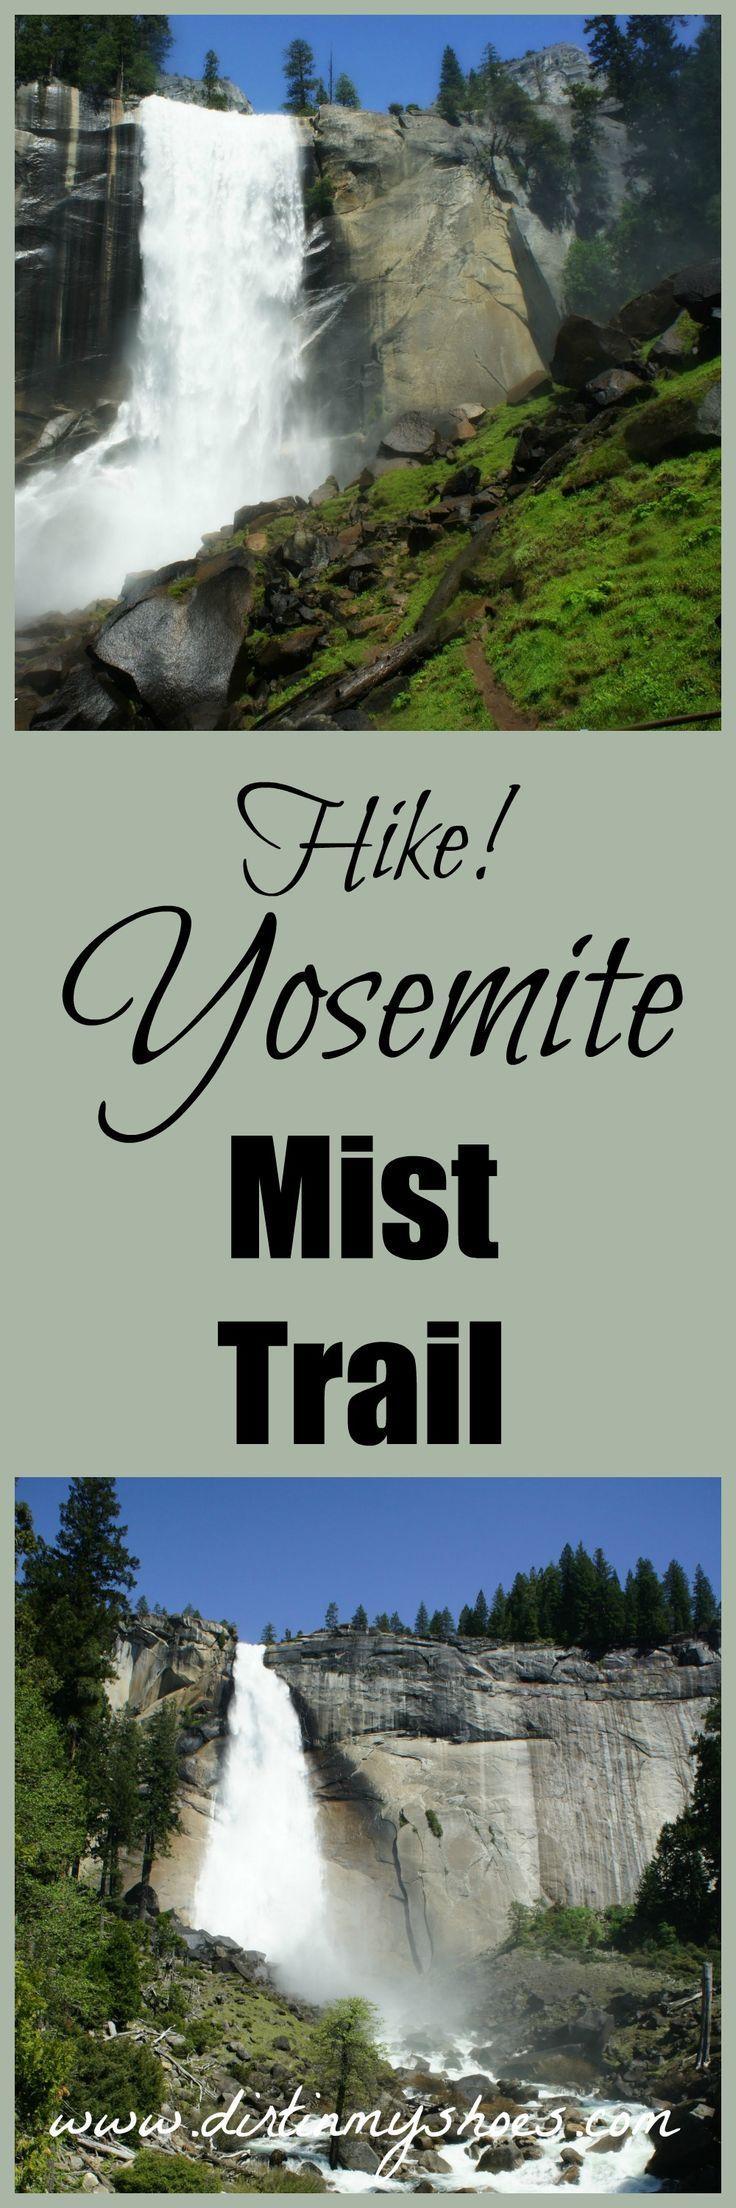 Yosemite The Mist Trail 392 best